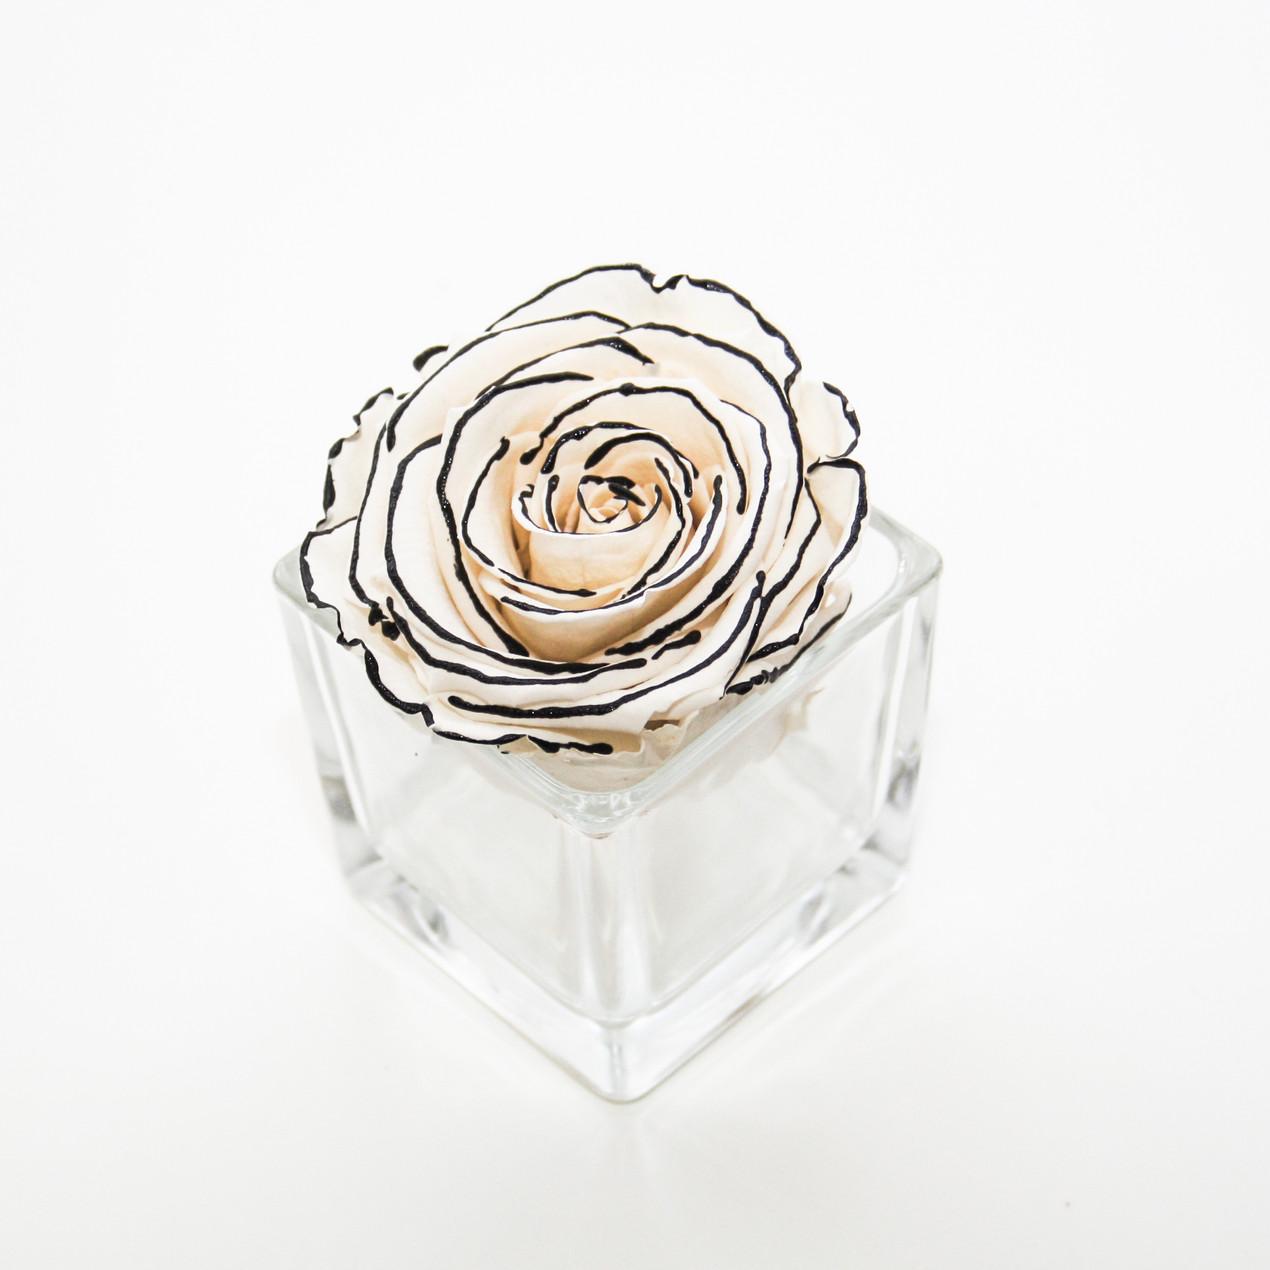 home interior home design preserved roses chanel rose year long roses forever rose